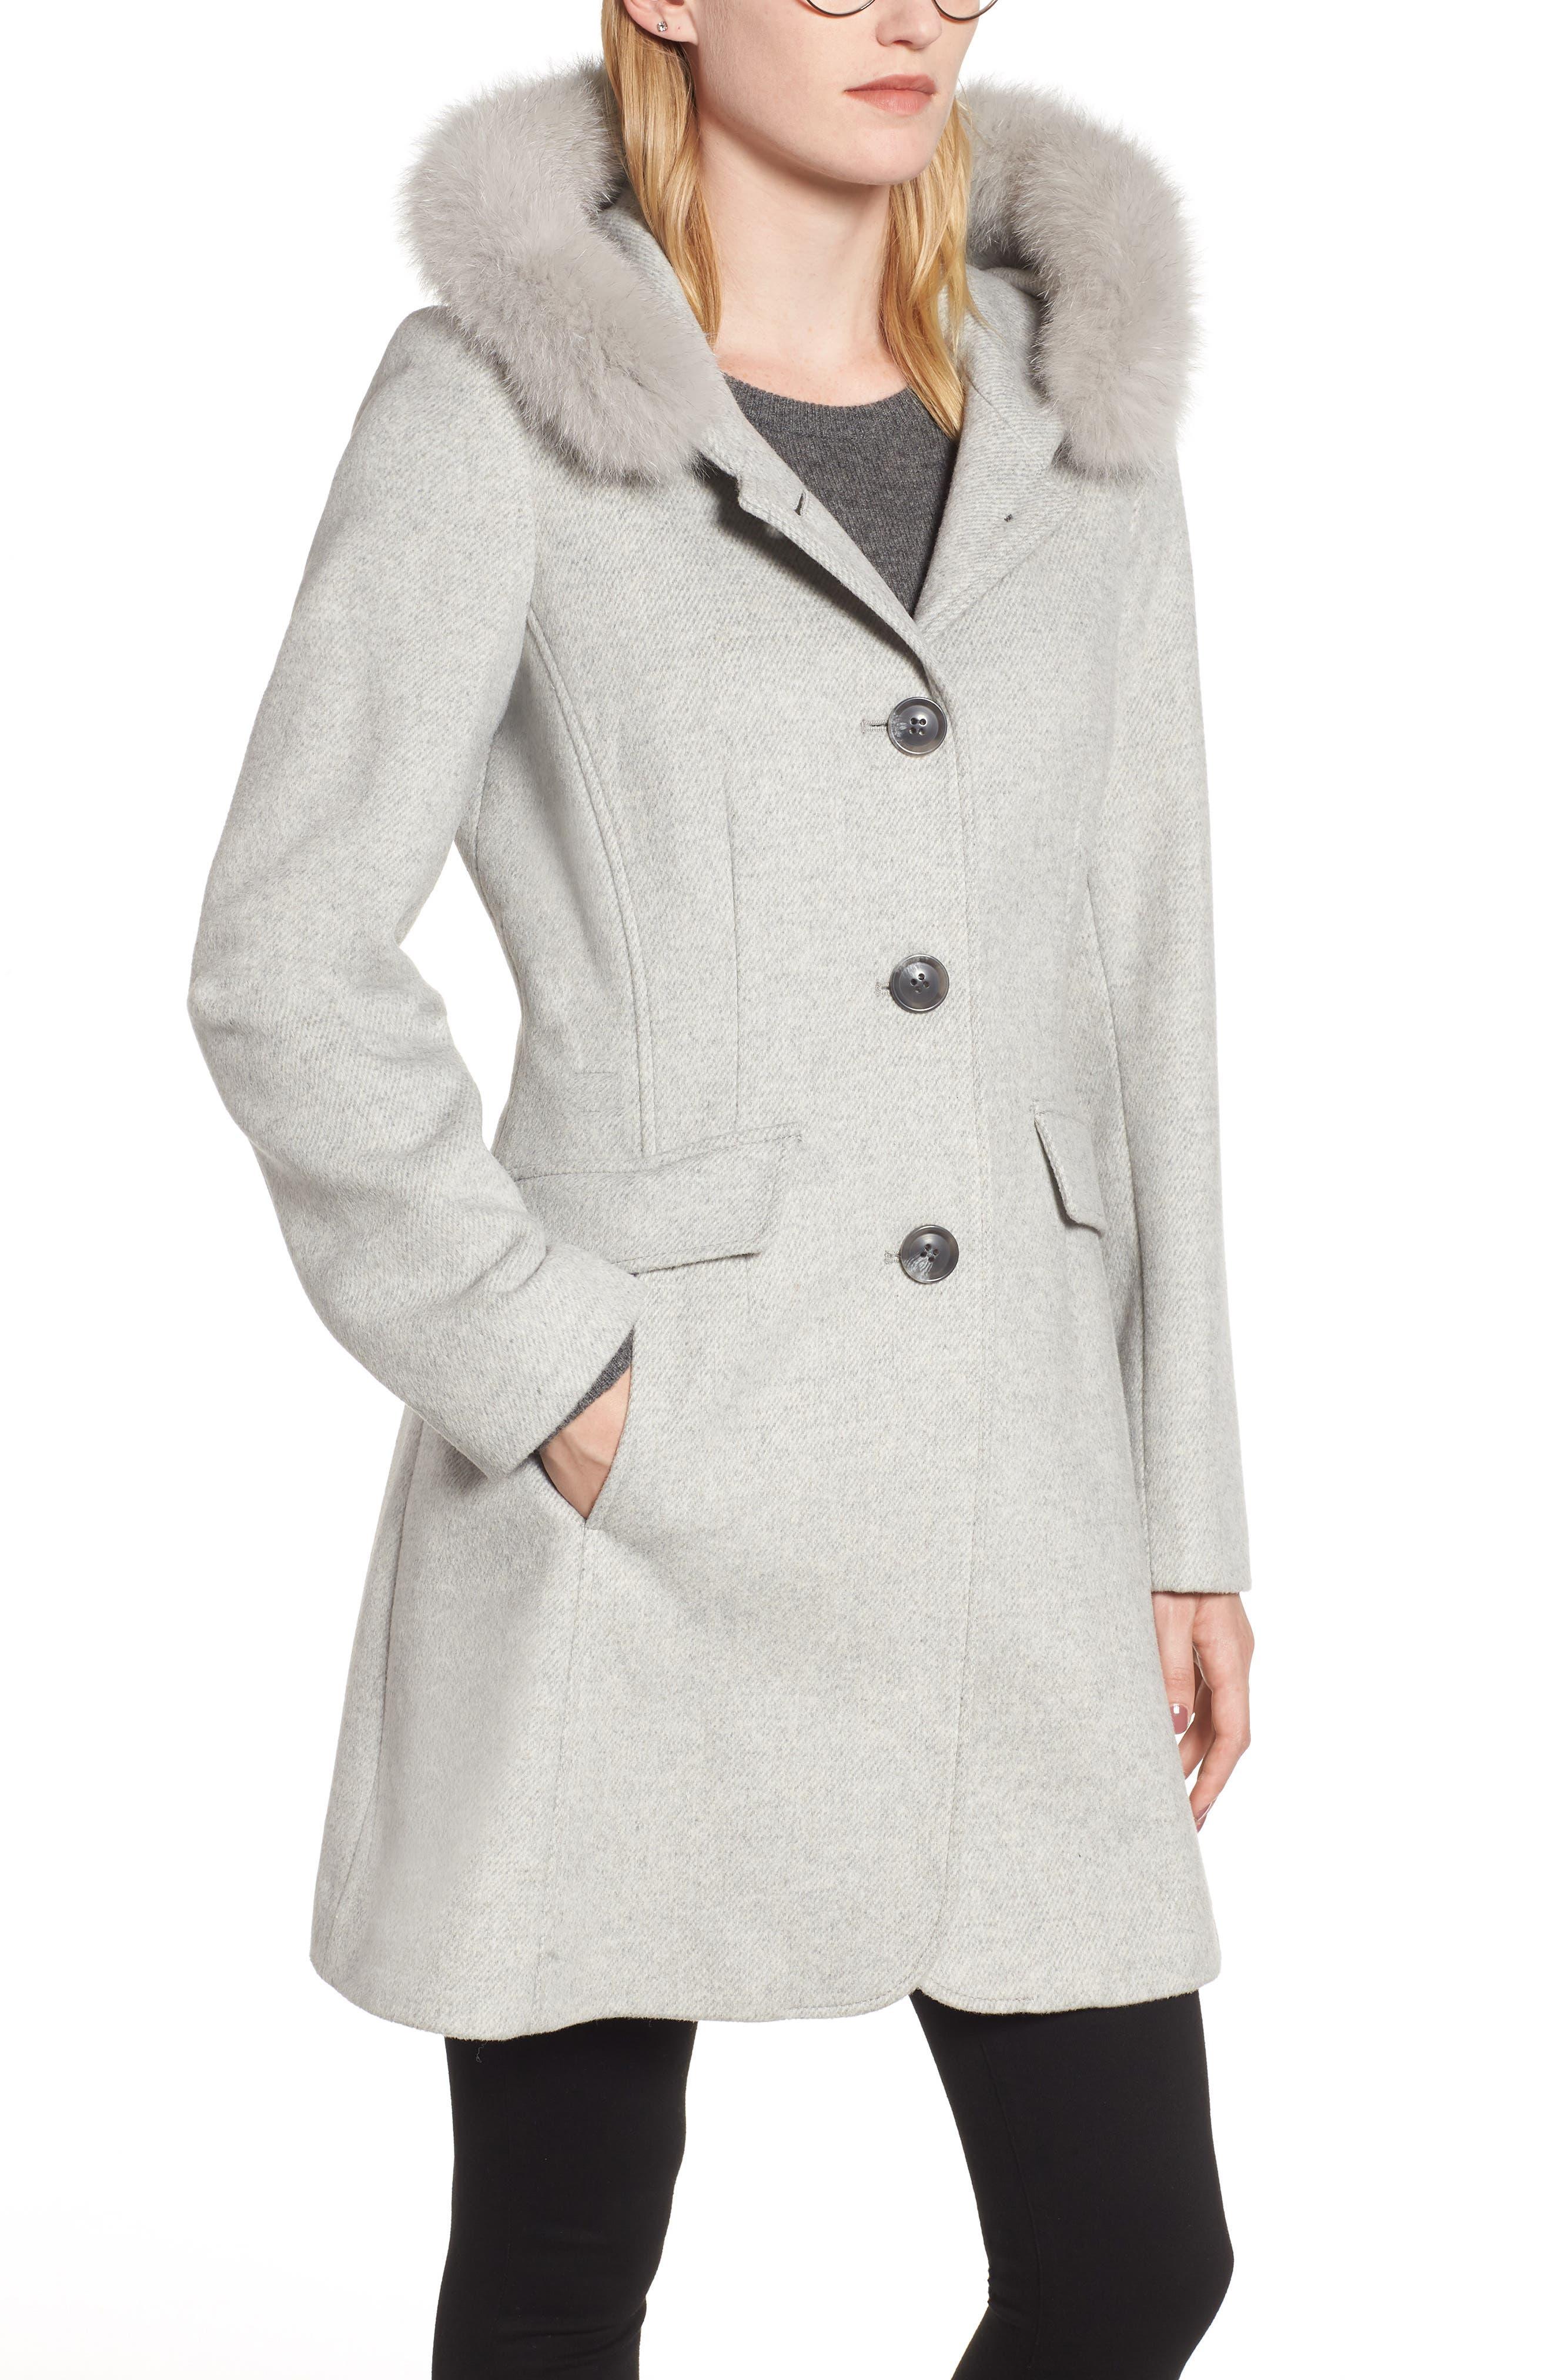 KRISTEN BLAKE,                             Genuine Fox Trim Hooded Wool Coat,                             Alternate thumbnail 4, color,                             GREY MELANGE